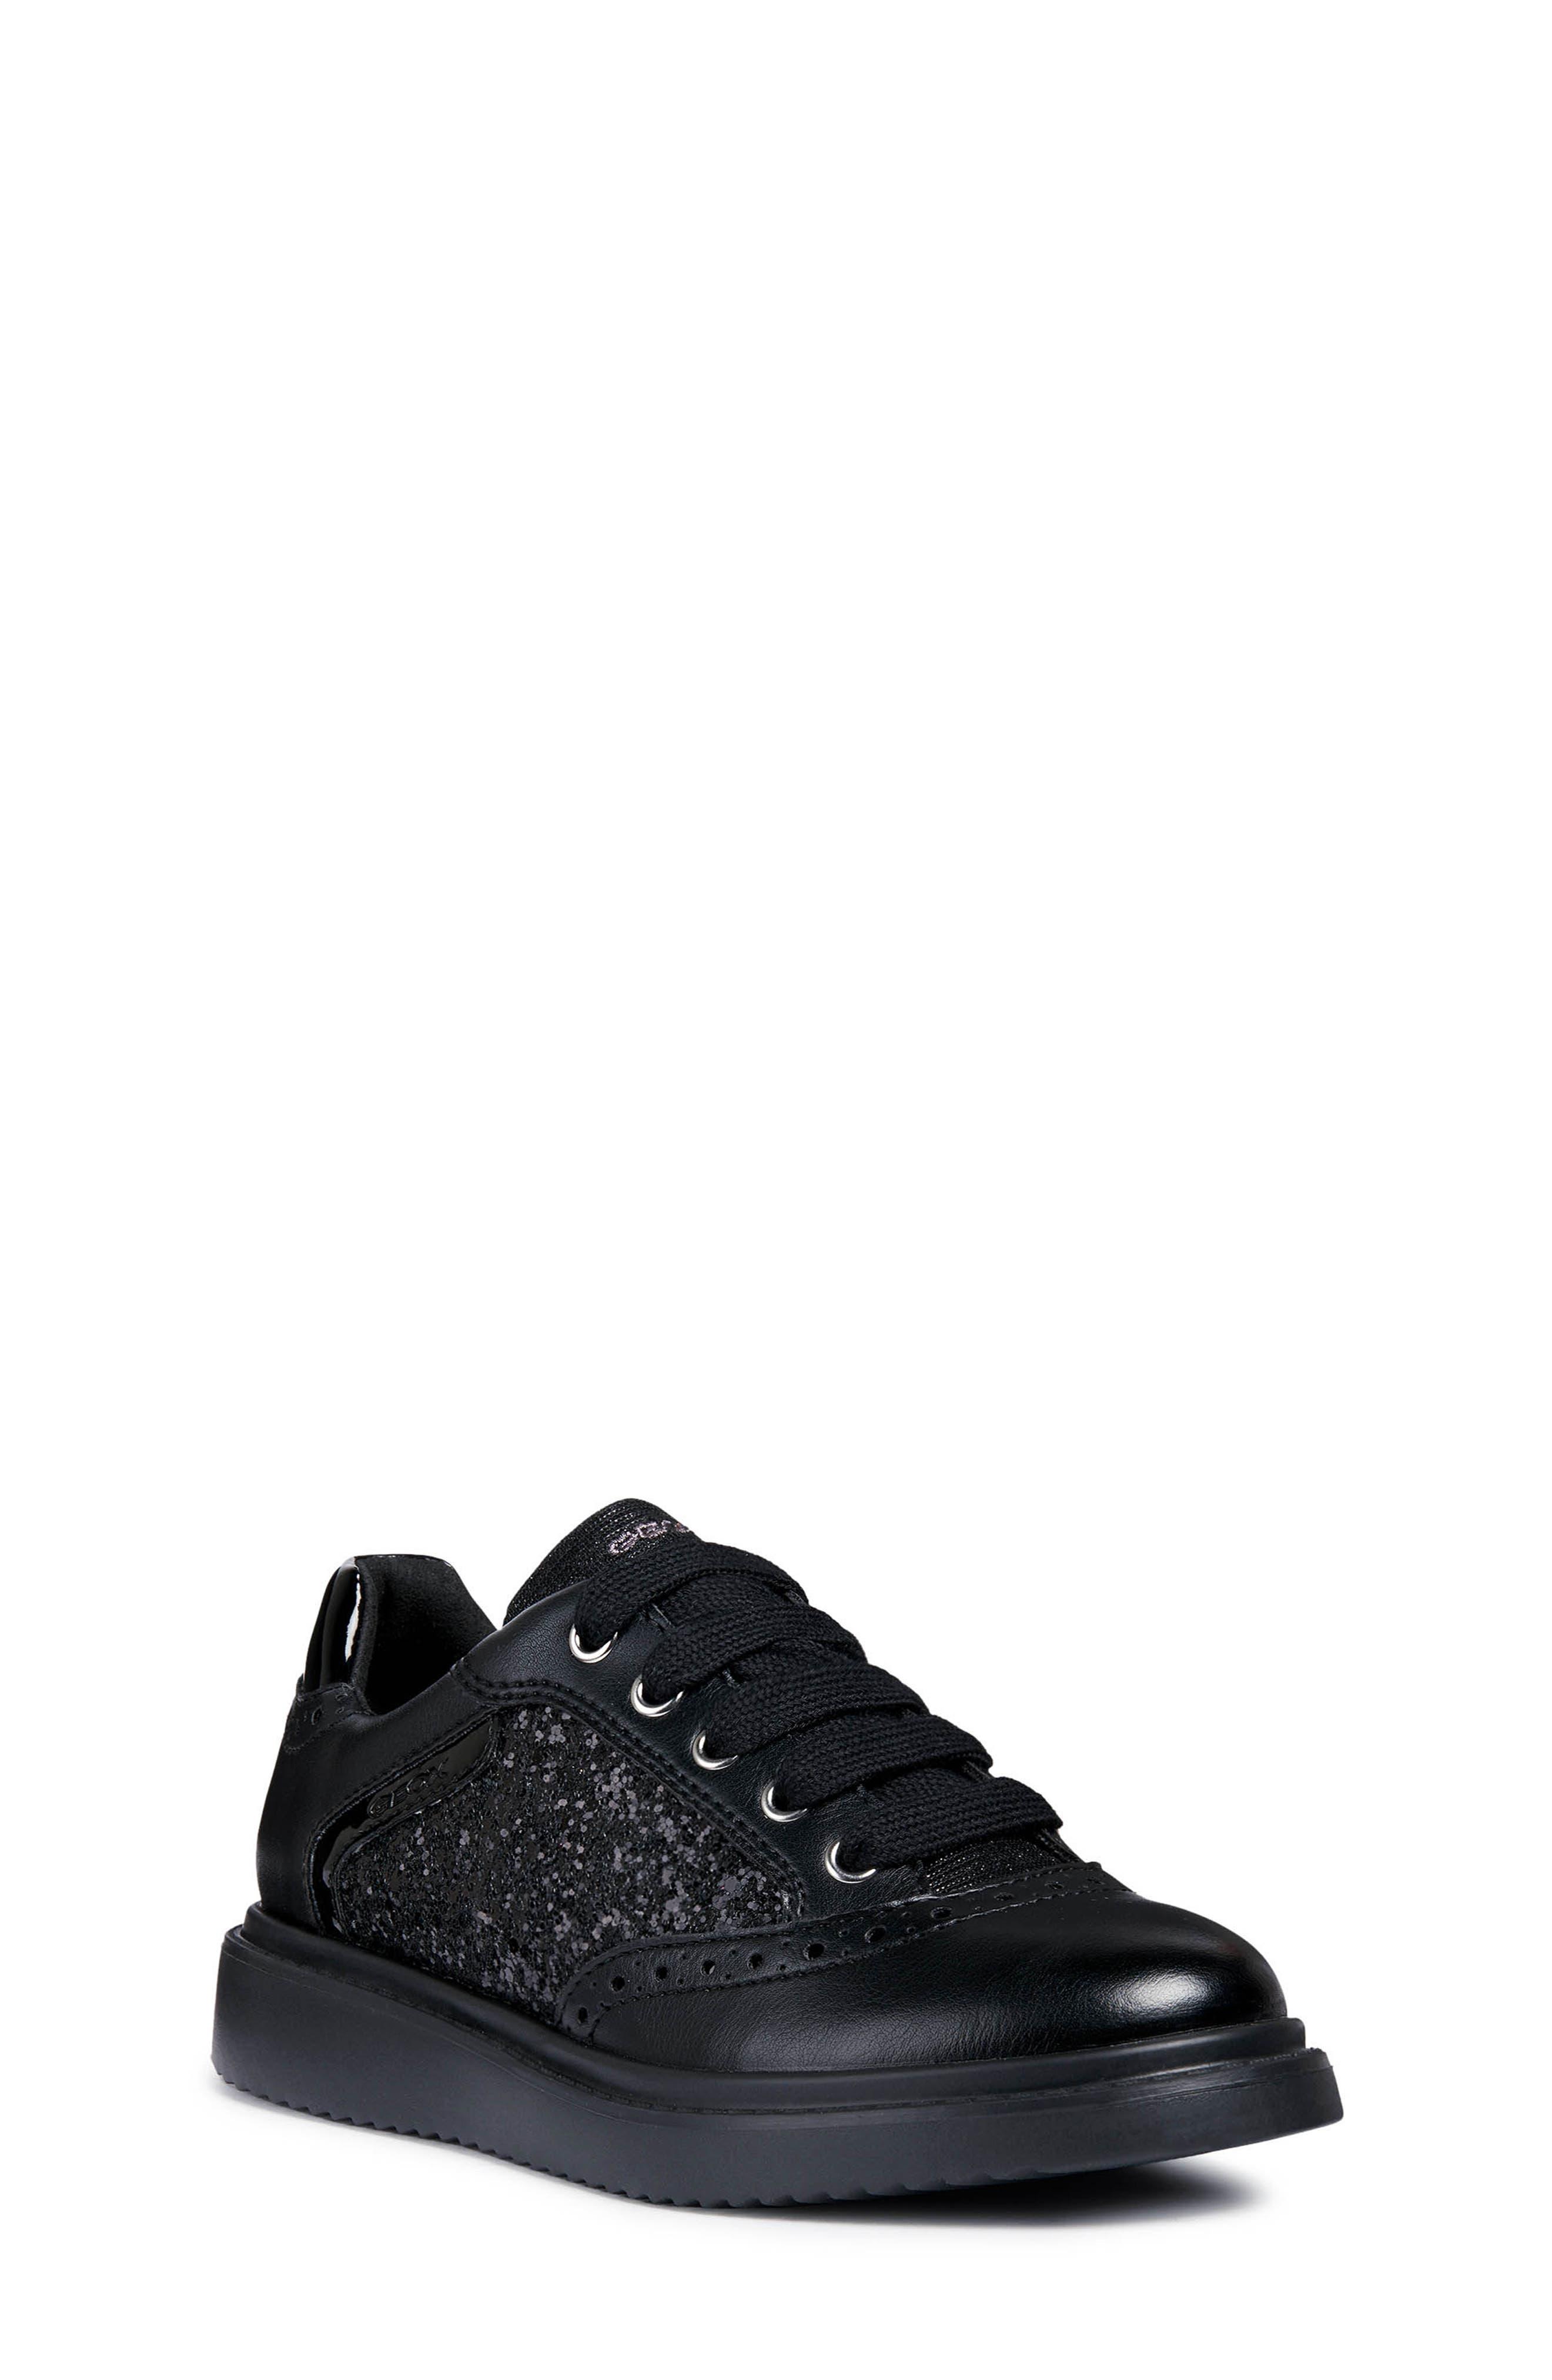 Thymar Sequin Sneaker,                             Main thumbnail 1, color,                             BLACK